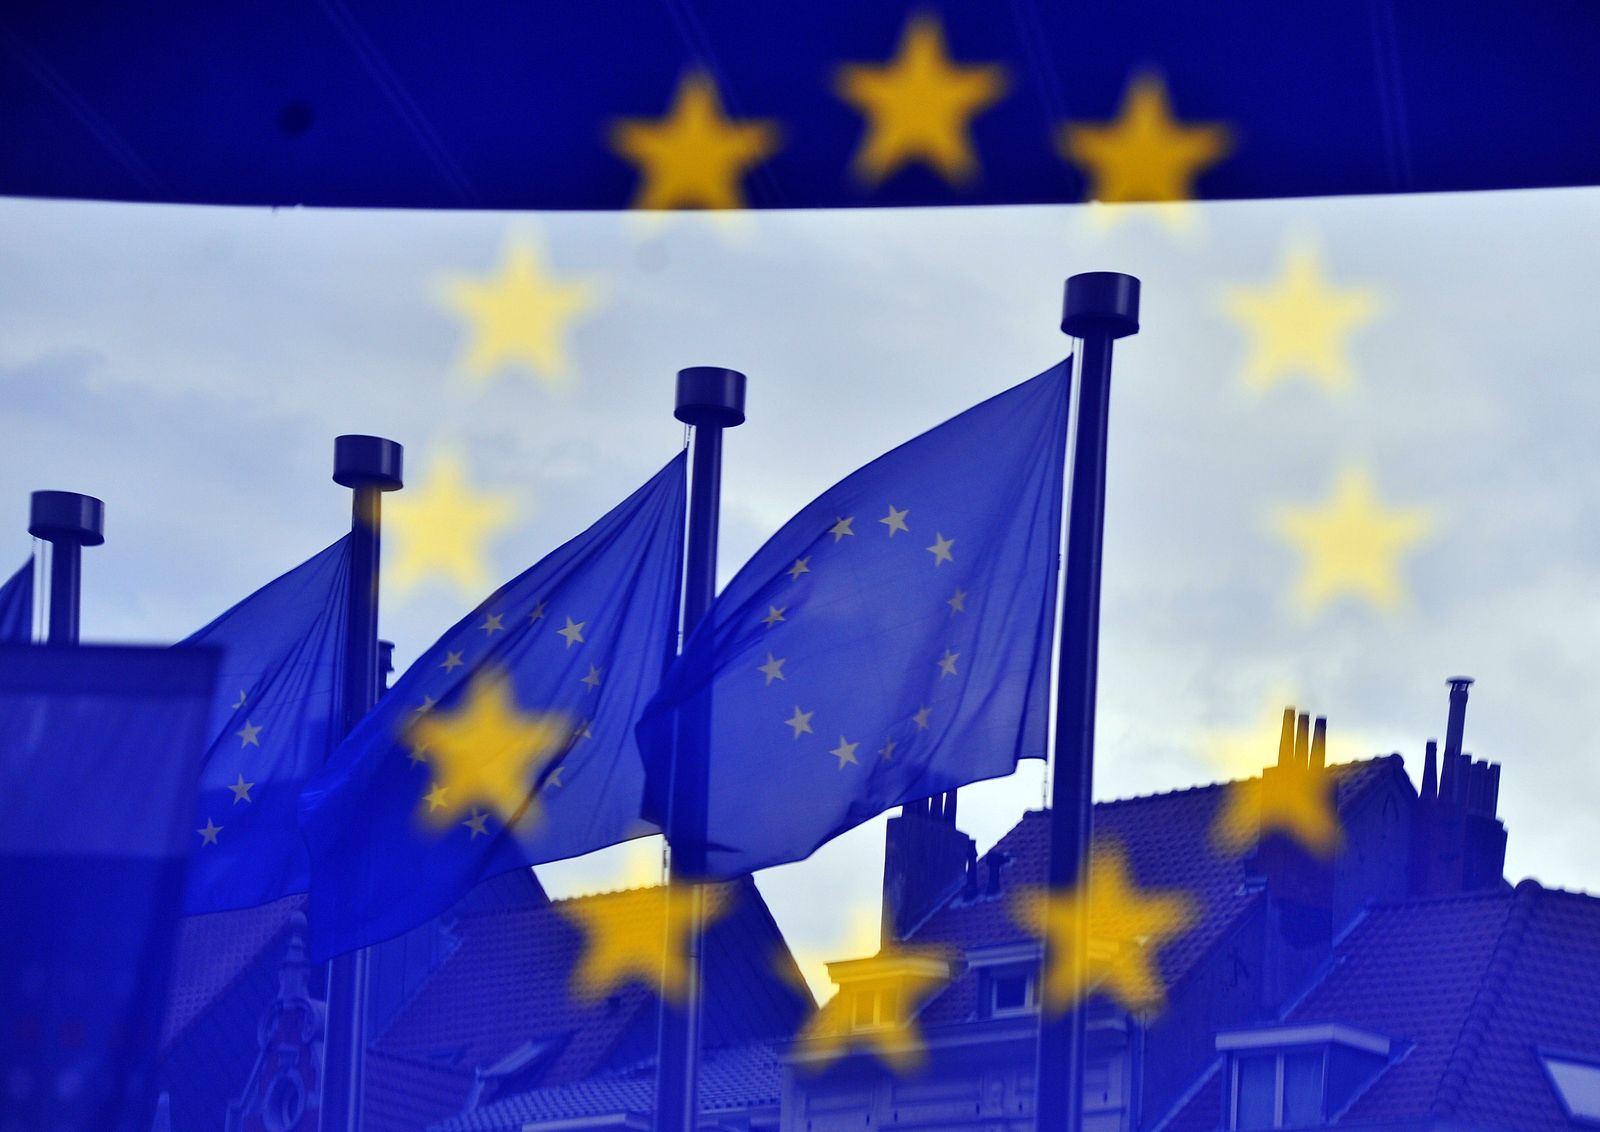 TOPSHOTS-BELGIUM-EU-VOTE